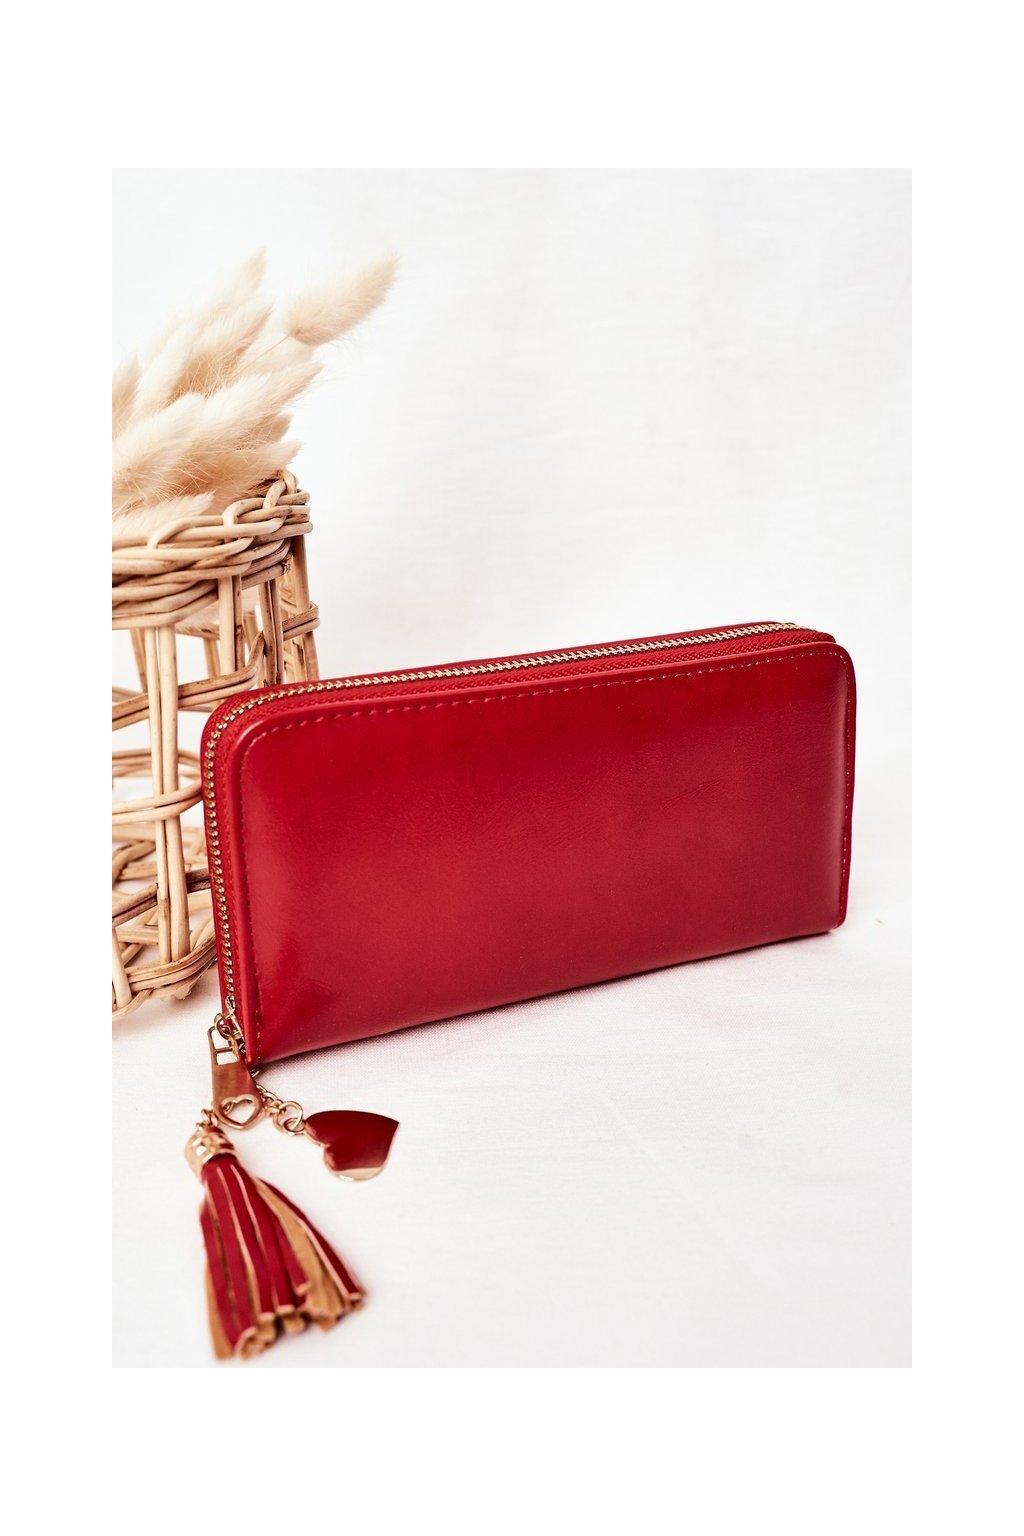 Peňaženka farba červená kód W-126 CZERWONY